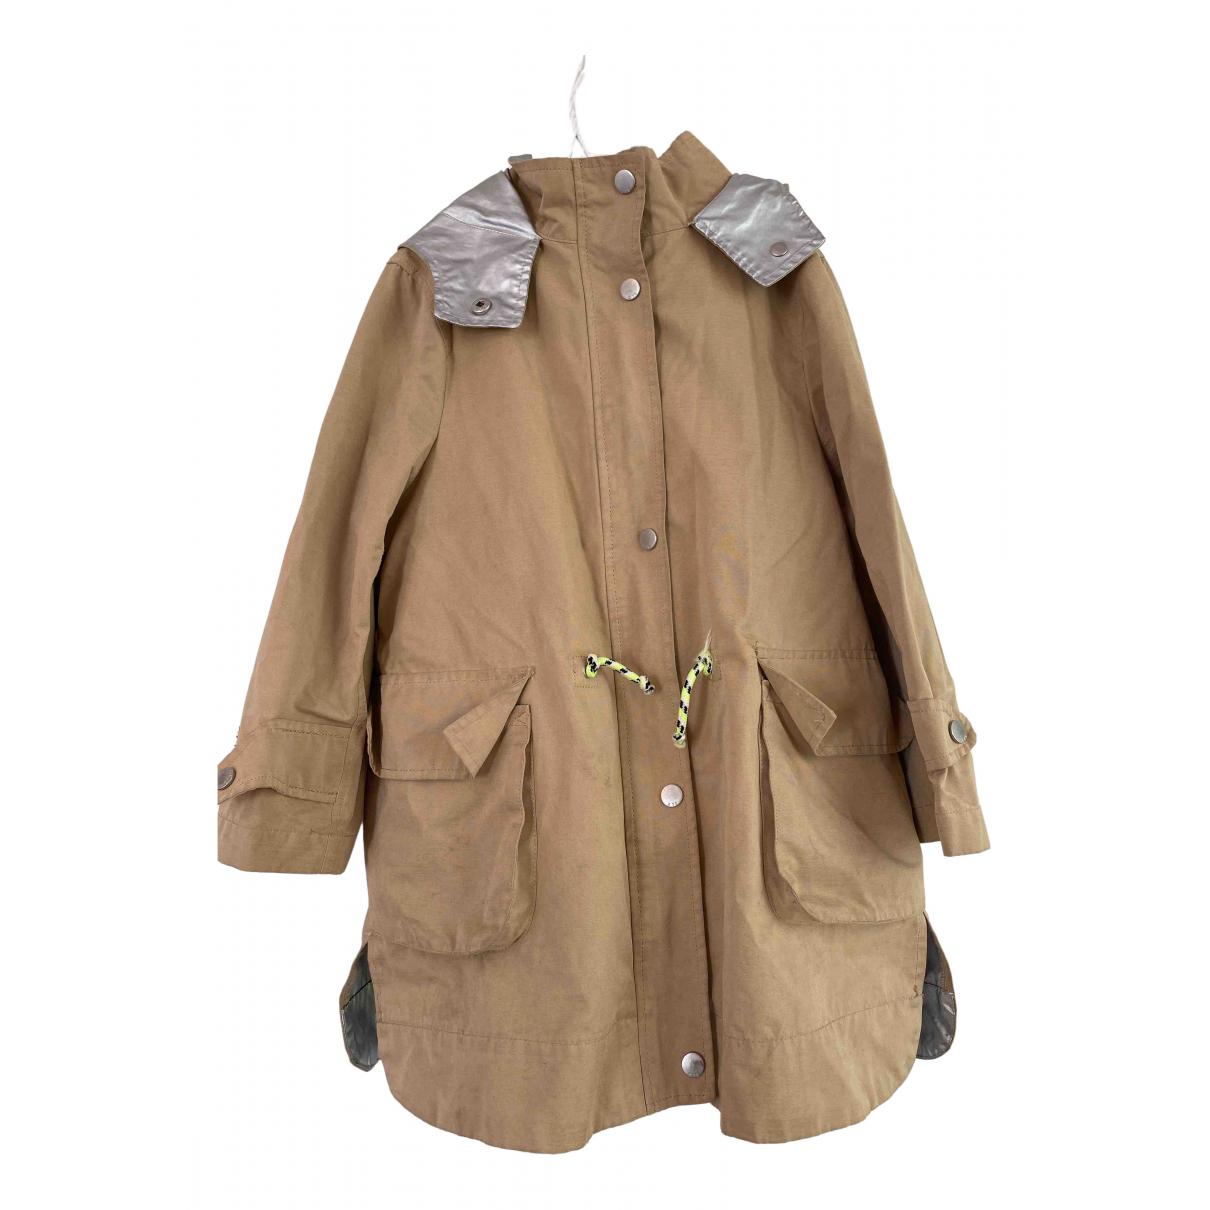 Abrigo, Chaqueta en Algodon Beige Zara